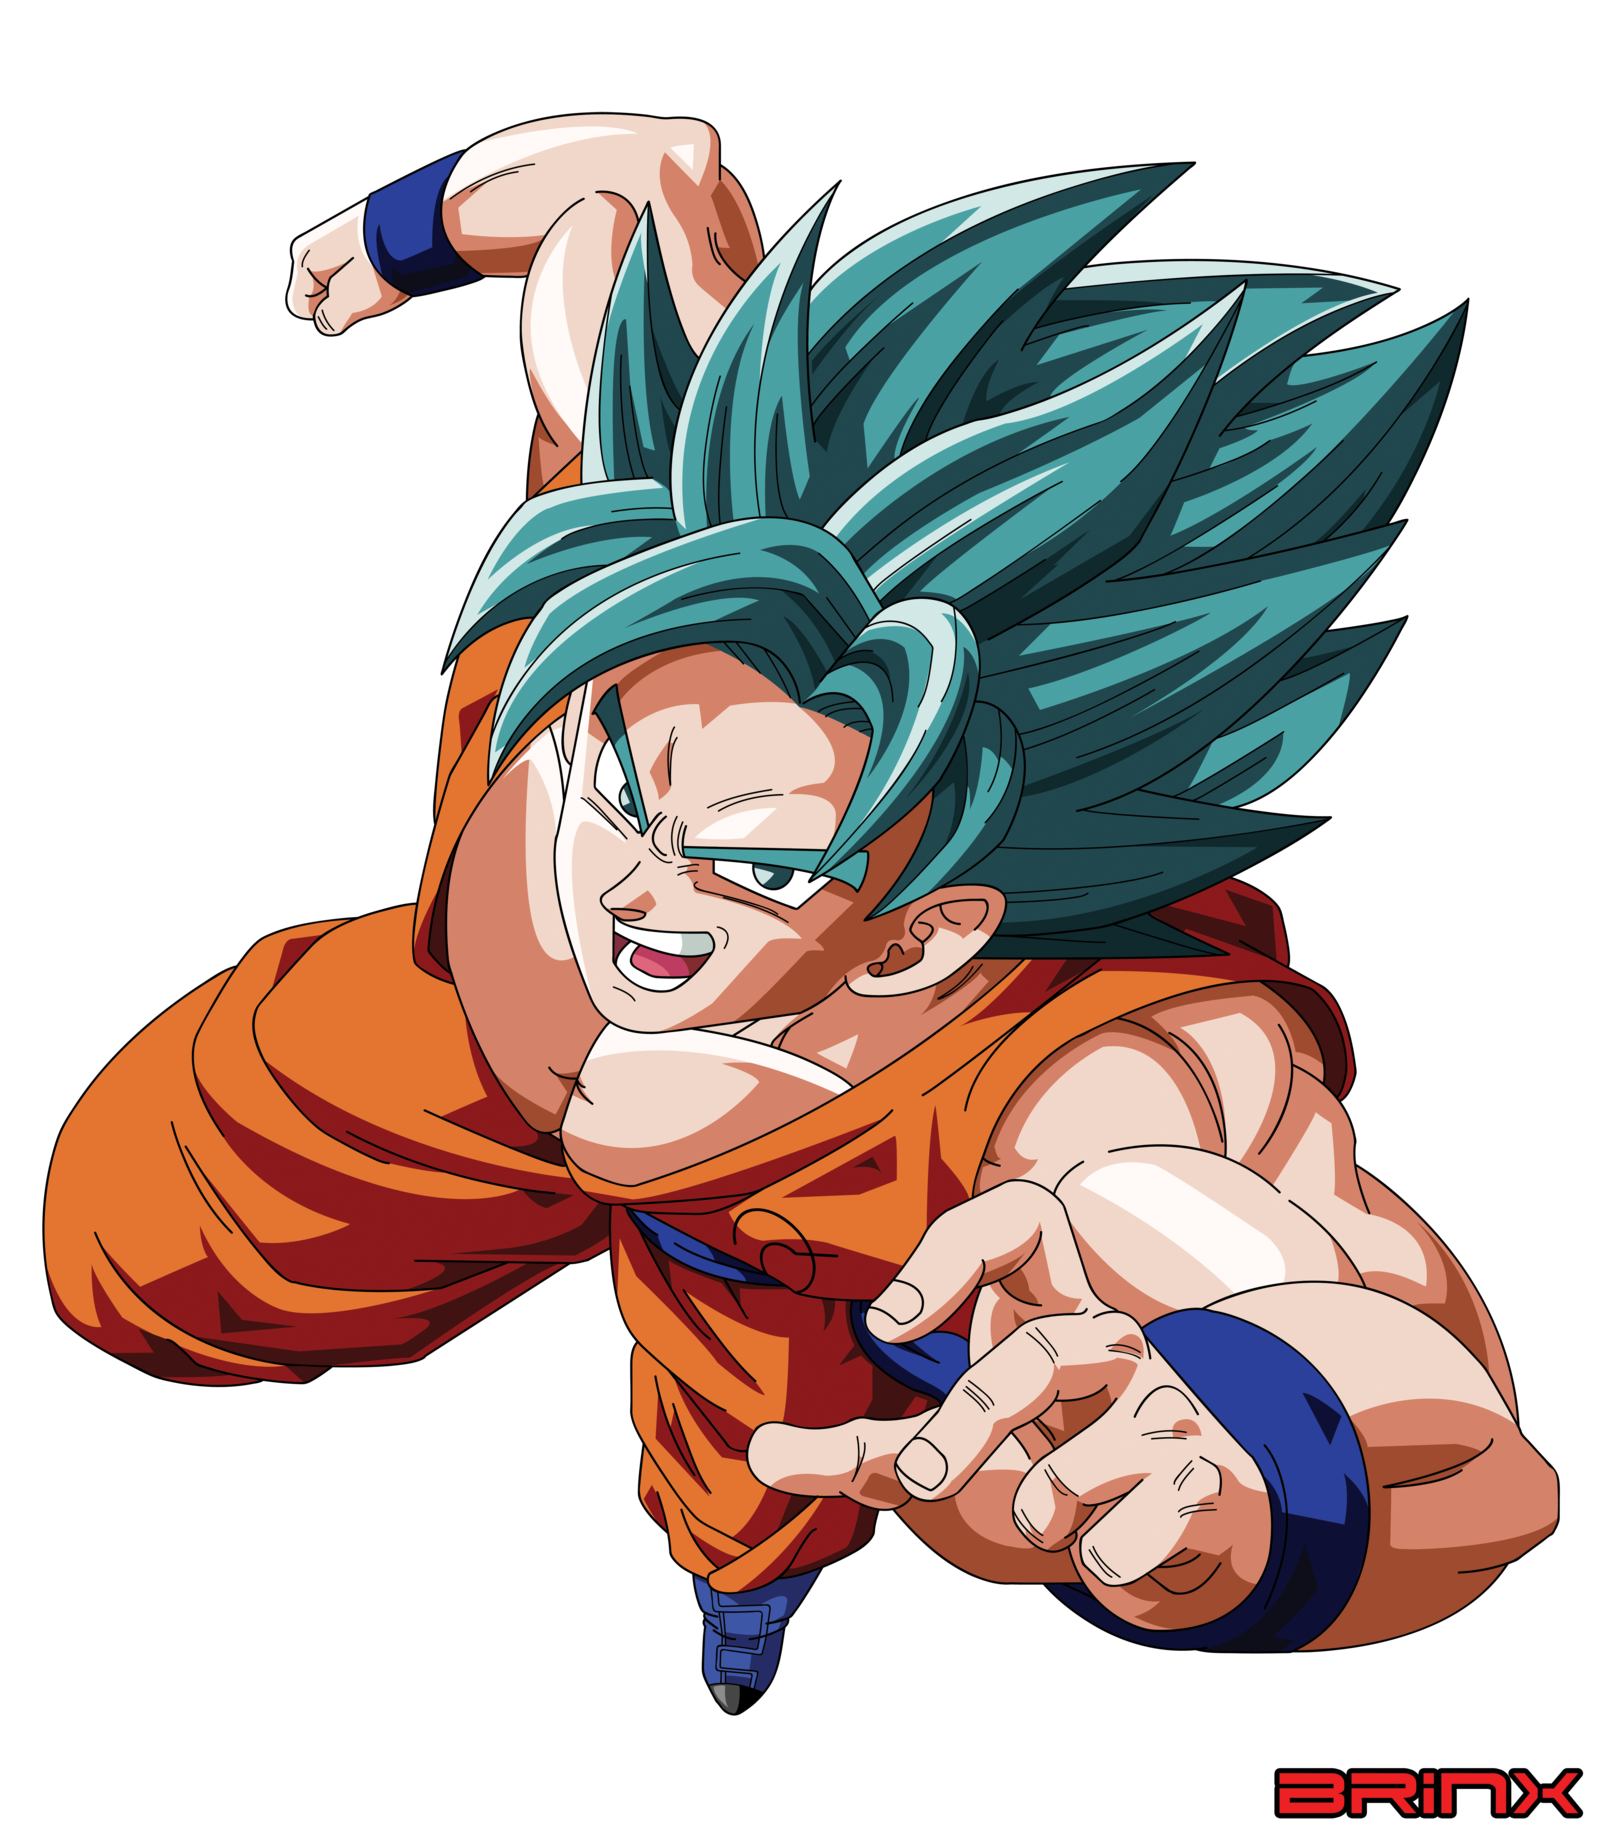 Ssgssj Goku Vector Goku Dragon Dall Z Dragon Ball Super Goku